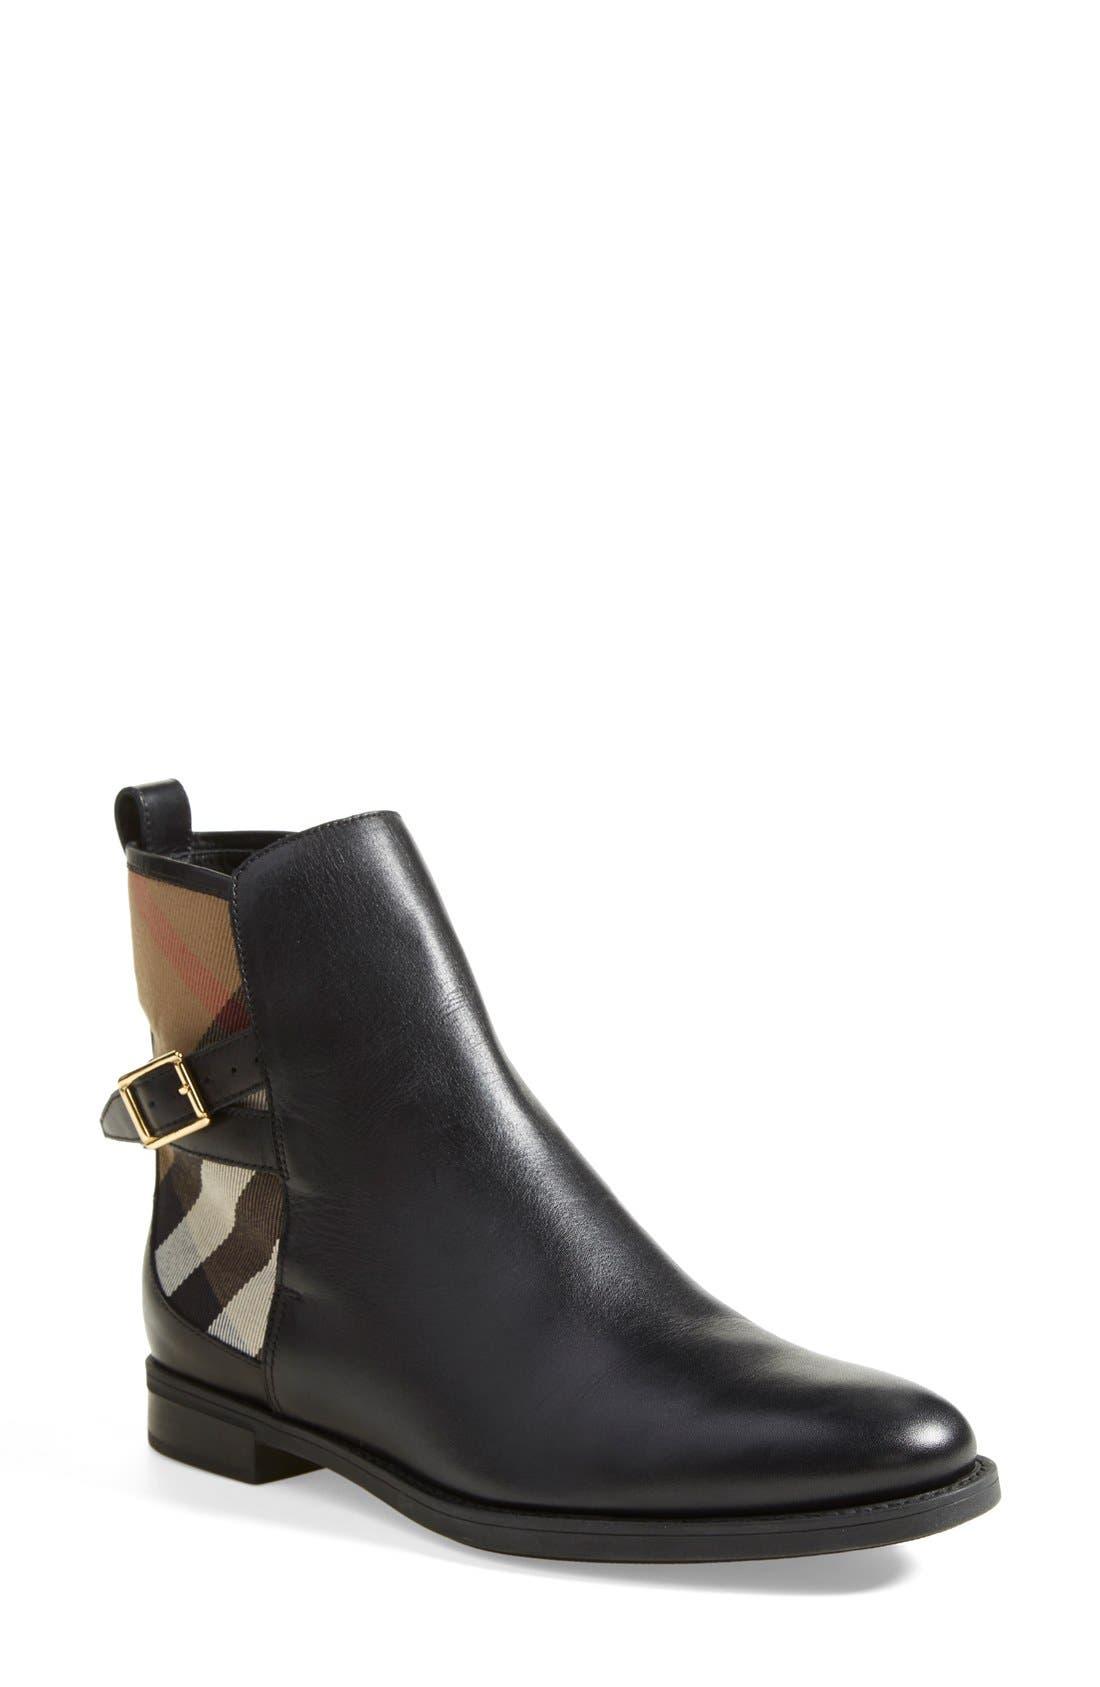 Main Image - Burberry 'Richardson' Leather Boot (Women)